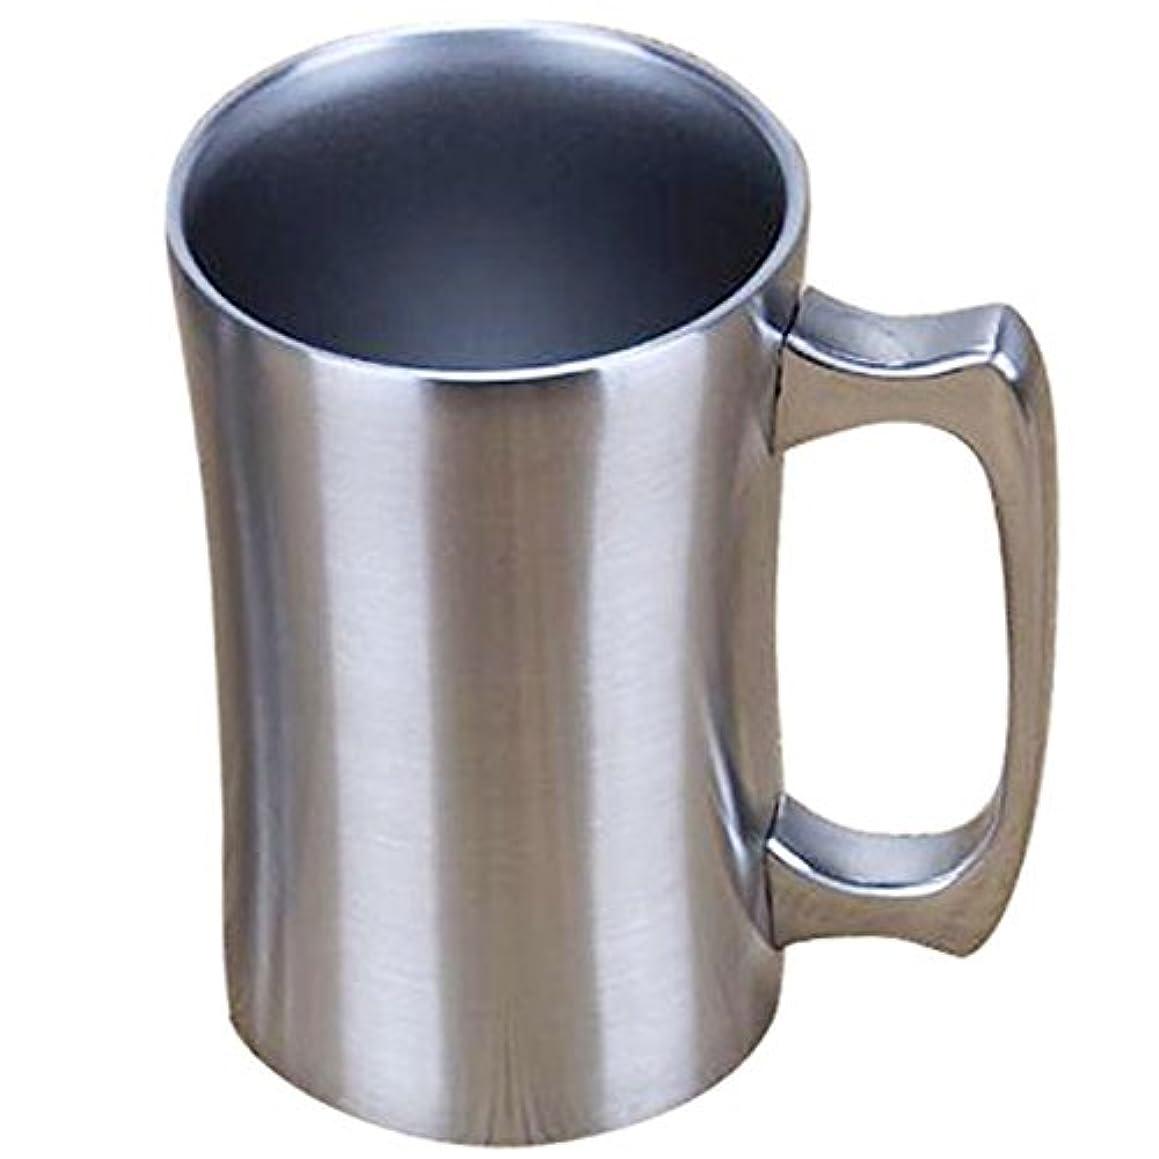 Insulated Cup, OrgMemory Stainless Steel Coffee Mug, 20 oz Coffee Mug, (560 ml), Double Wall Beer Stein, Tumbler with Handle, Insulated Beer Mug with Lid